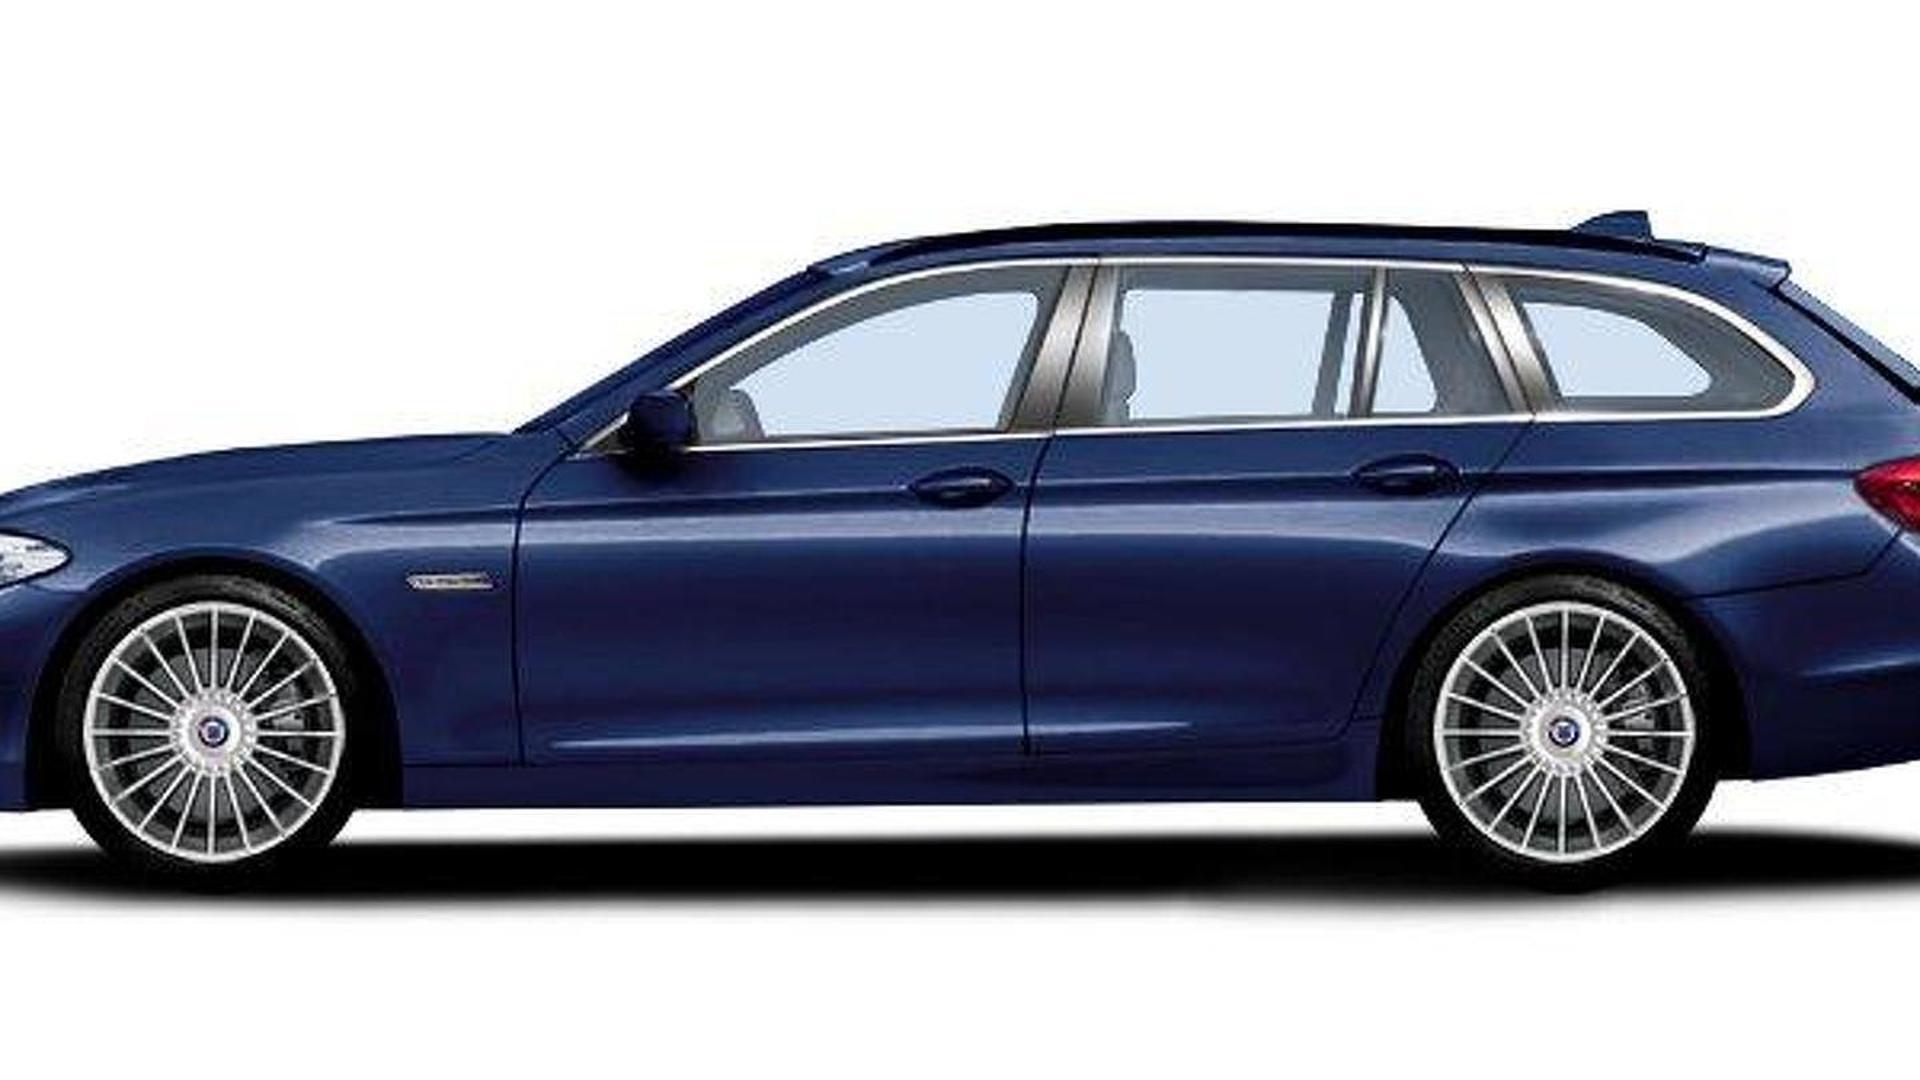 BMW Alpina to bring 2011 B5 Bi-Turbo Touring to Geneva